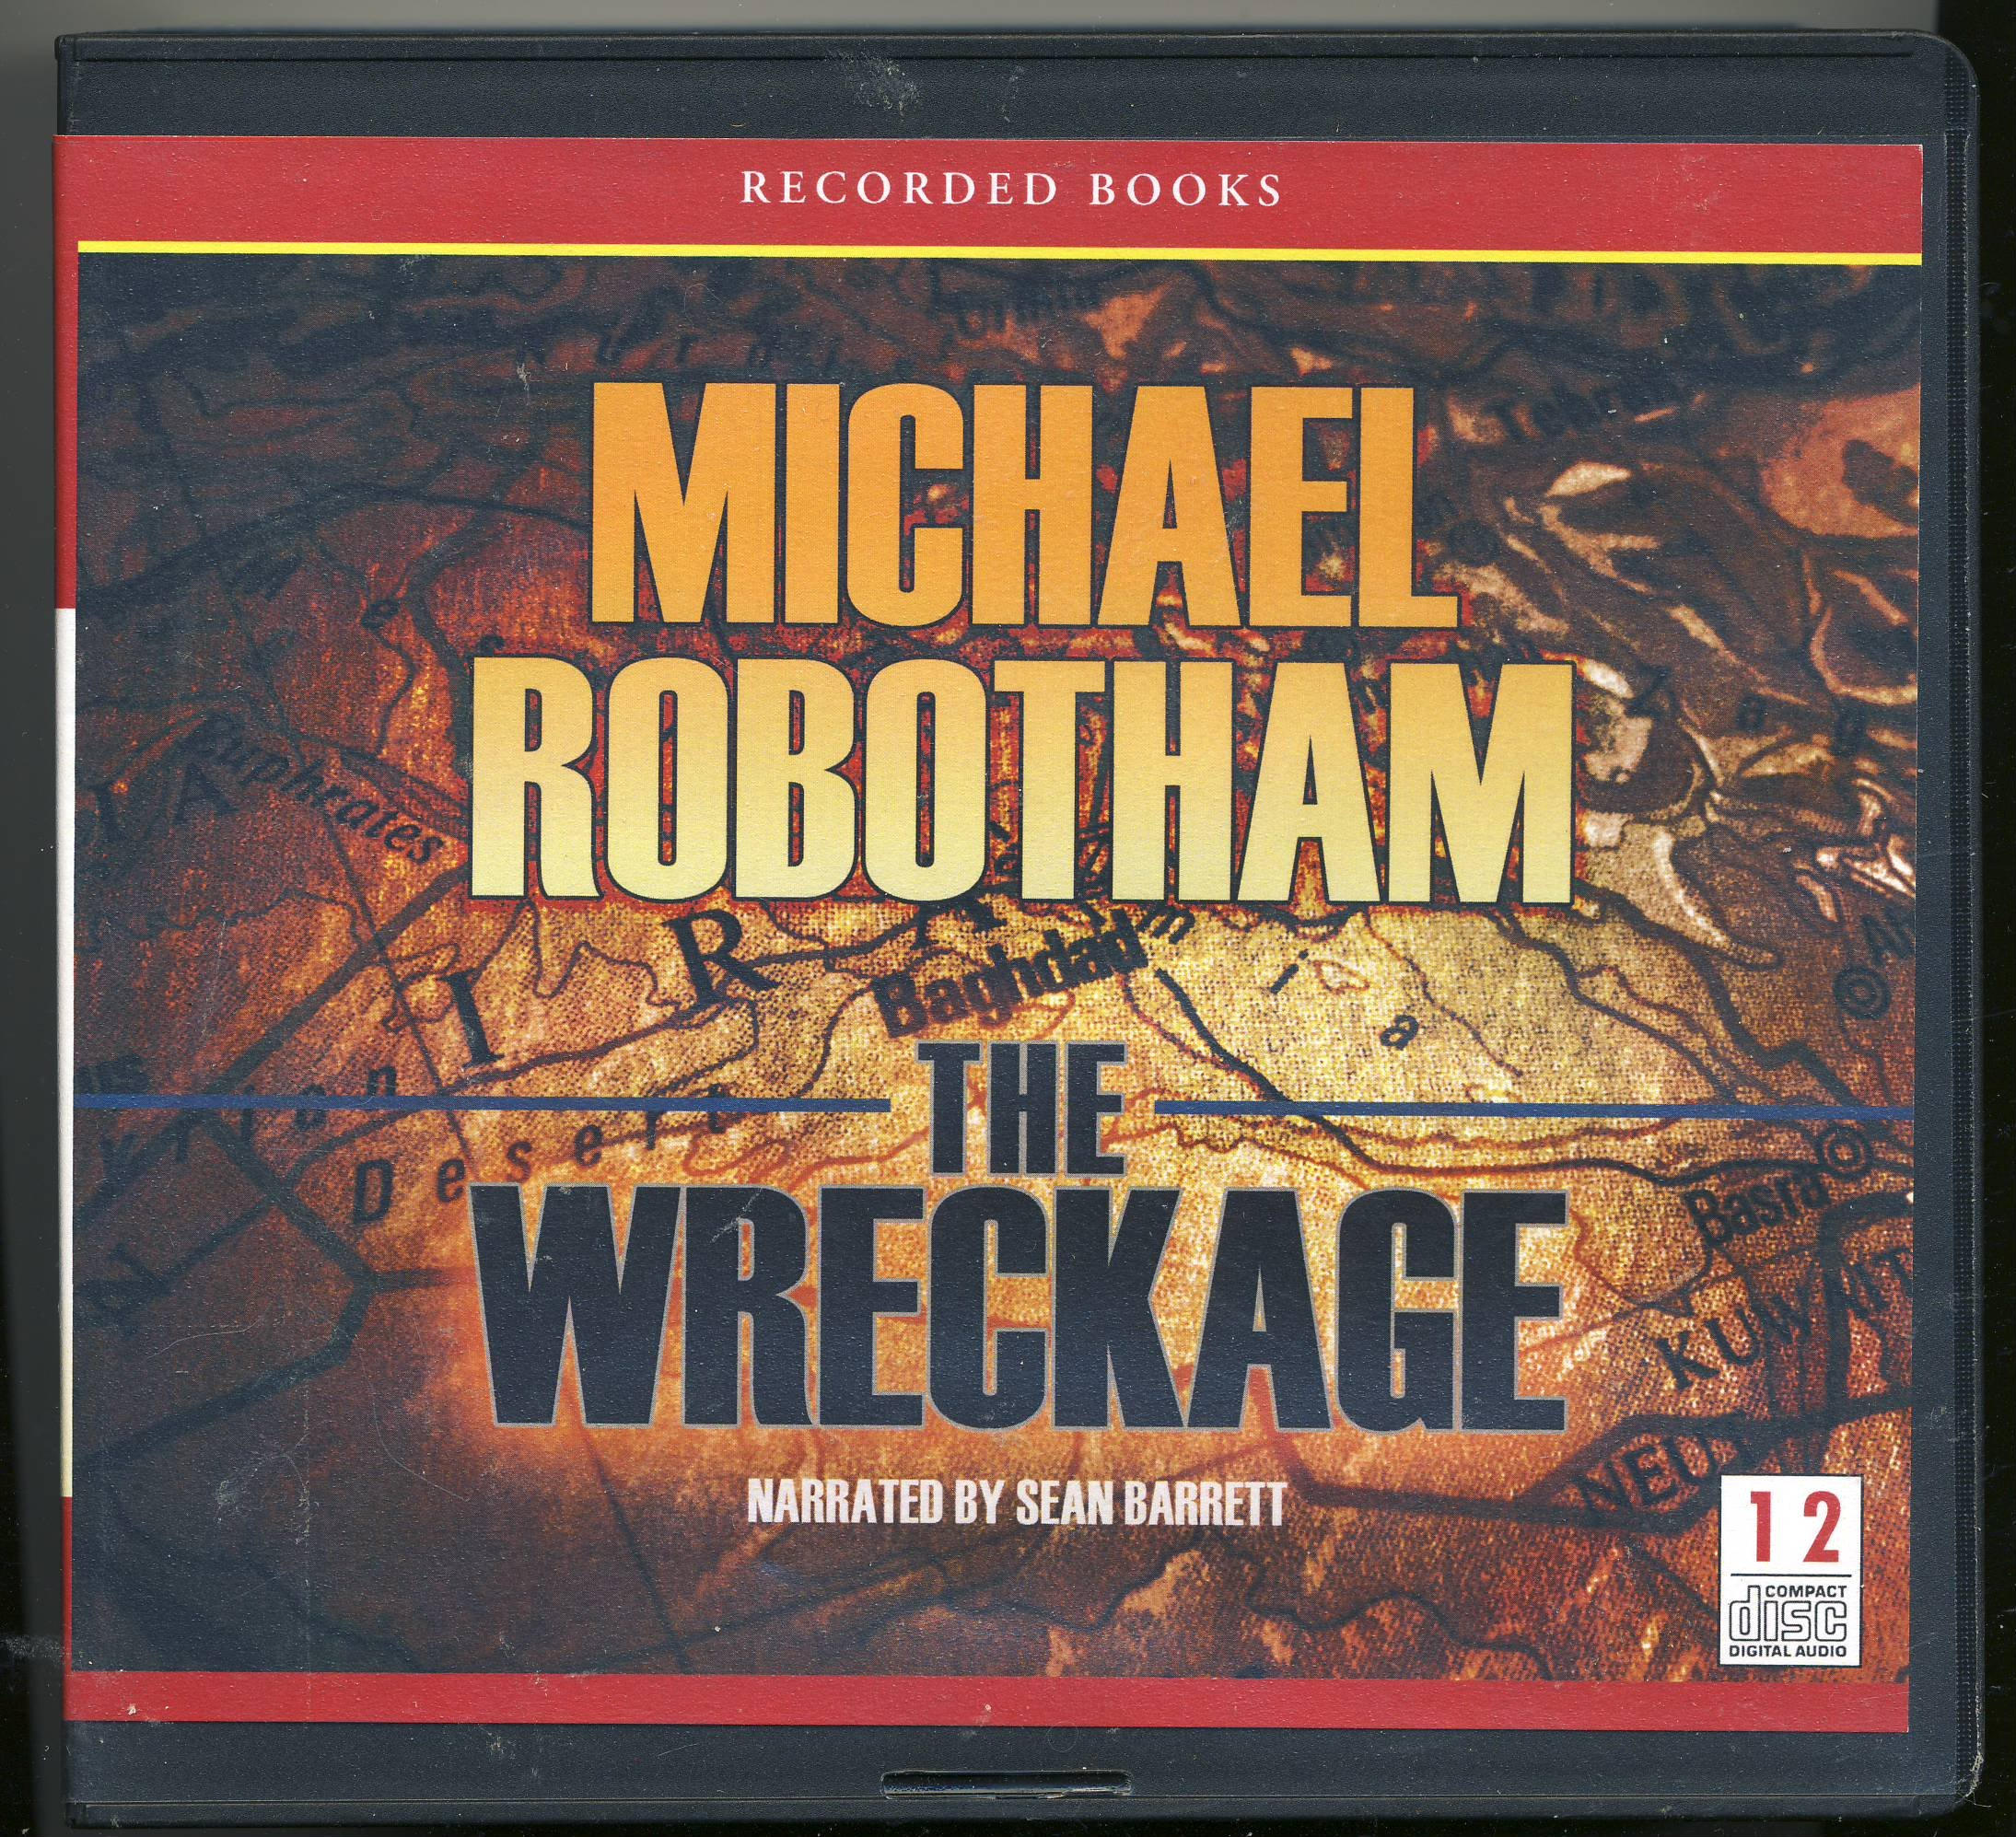 The Wreckage By Michael Robotham Unabridged CD Audiobook Sean Barrett 9781449858704 Amazon Books